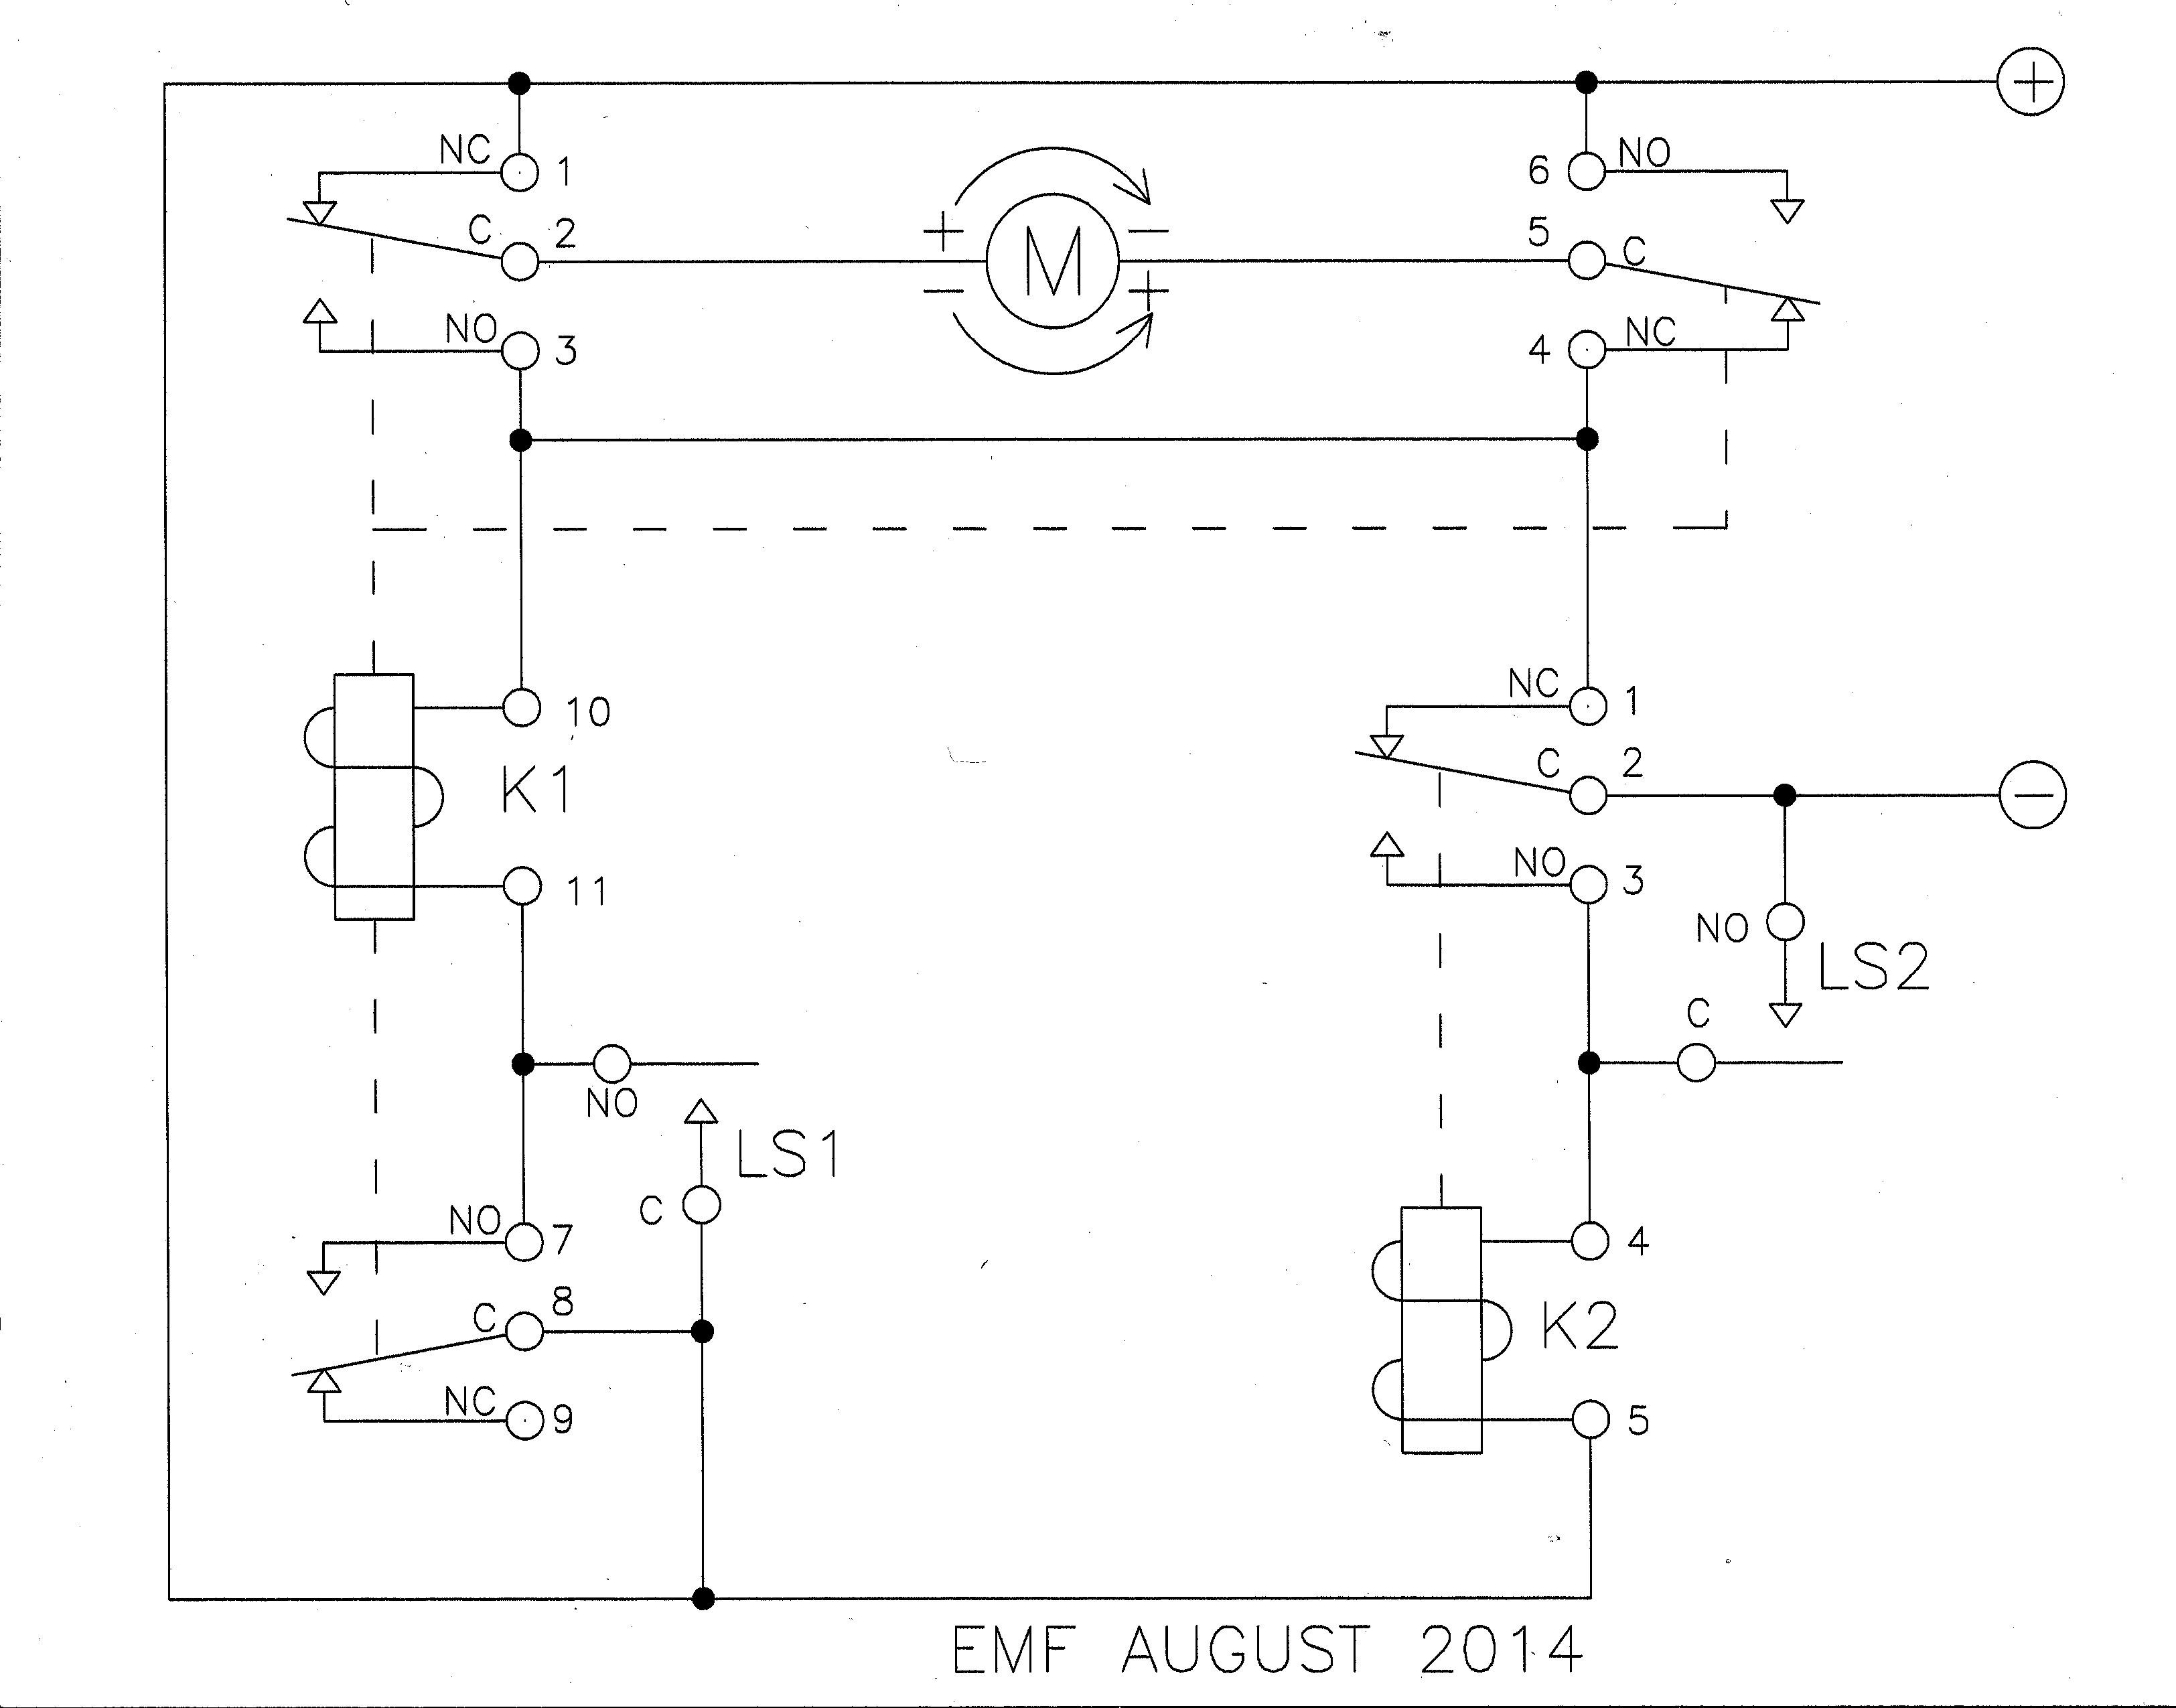 Western Ice Breaker Wiring Diagram Download Sample Cub Cadet Fresh Limit Switch